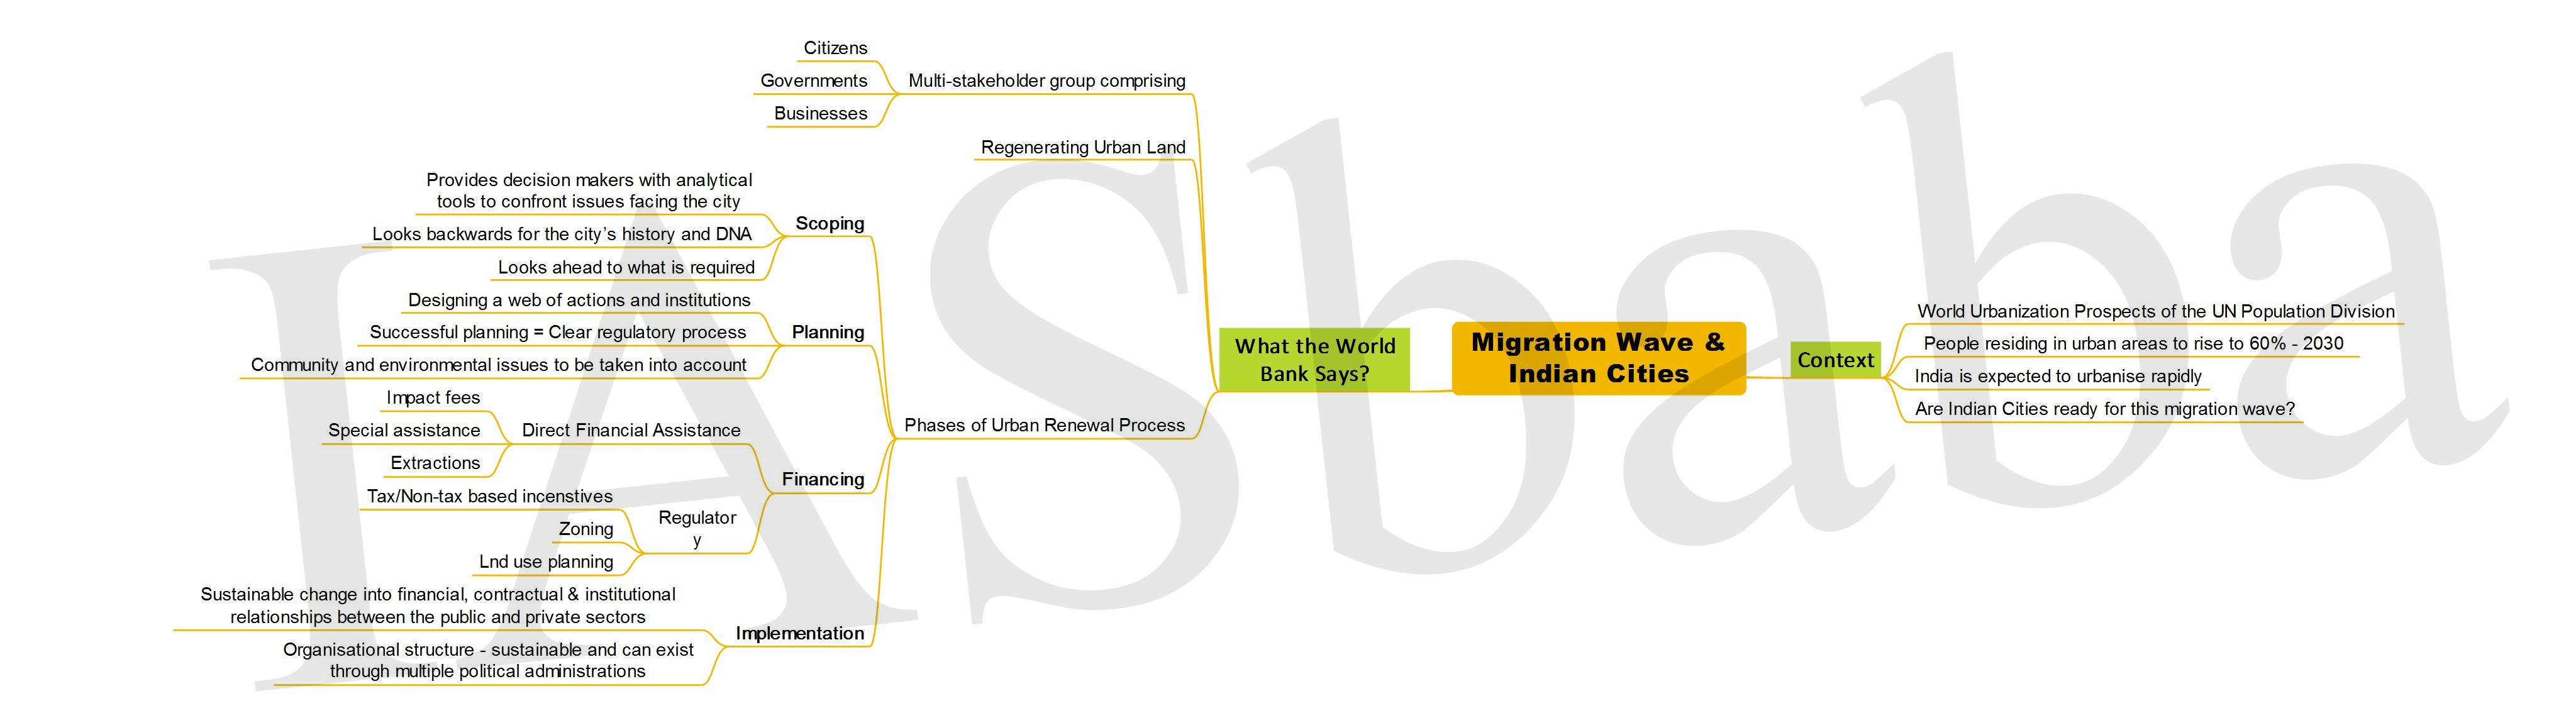 Migration Wave Indian Cities-IASbaba